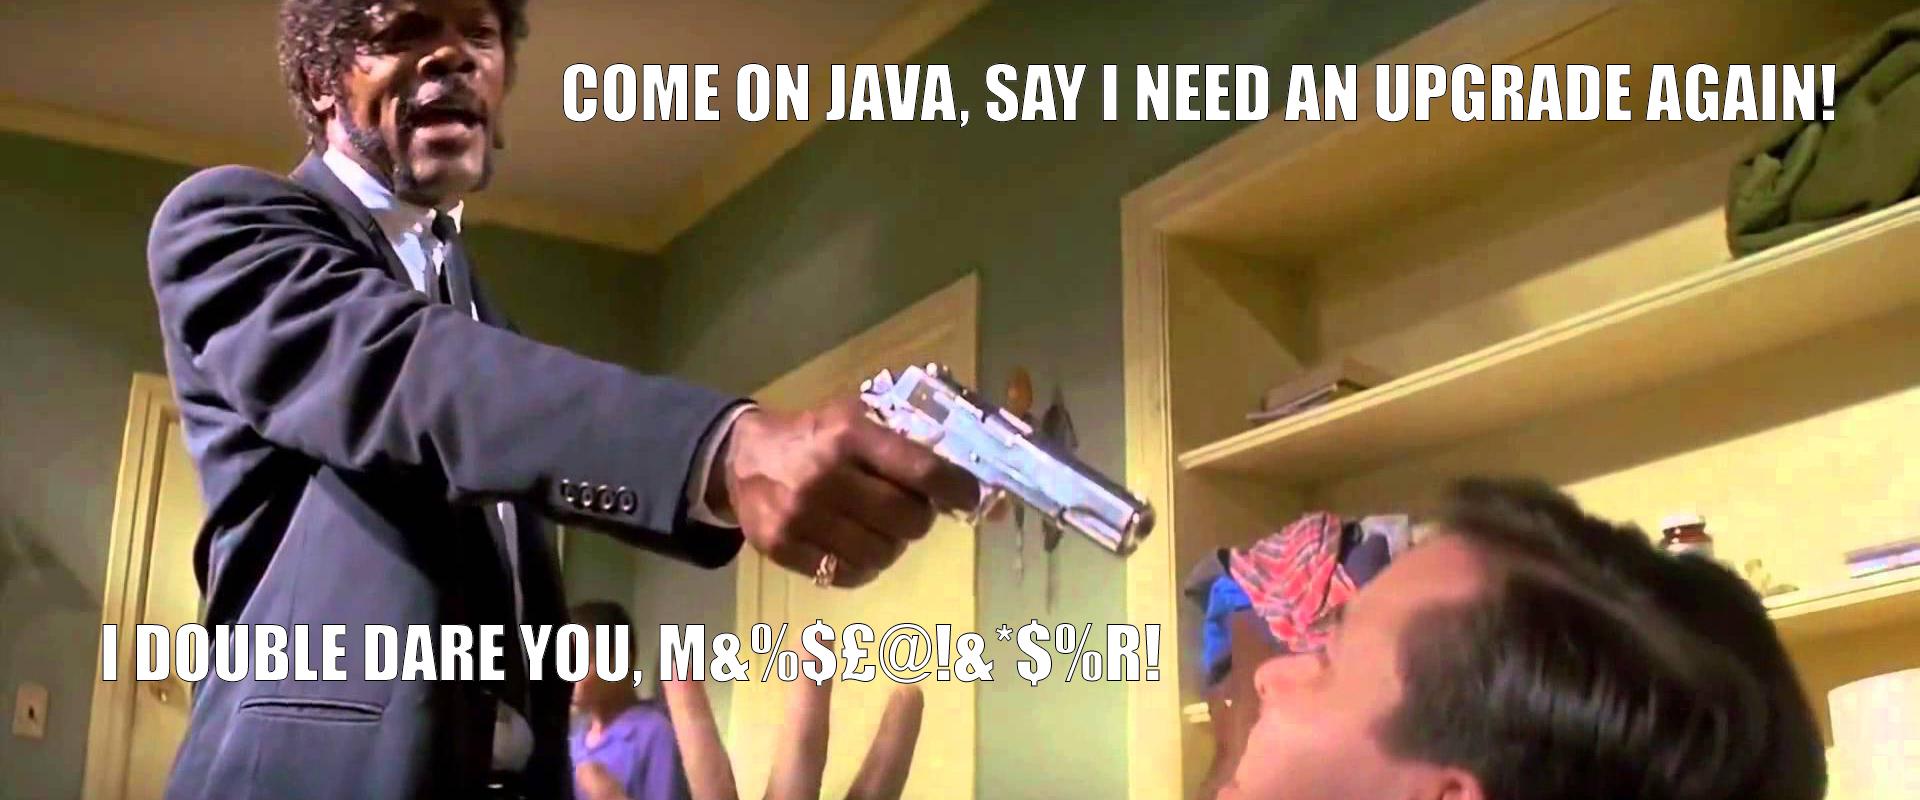 Safari - Open jnlp Files Not Download Them   PeteNetLive